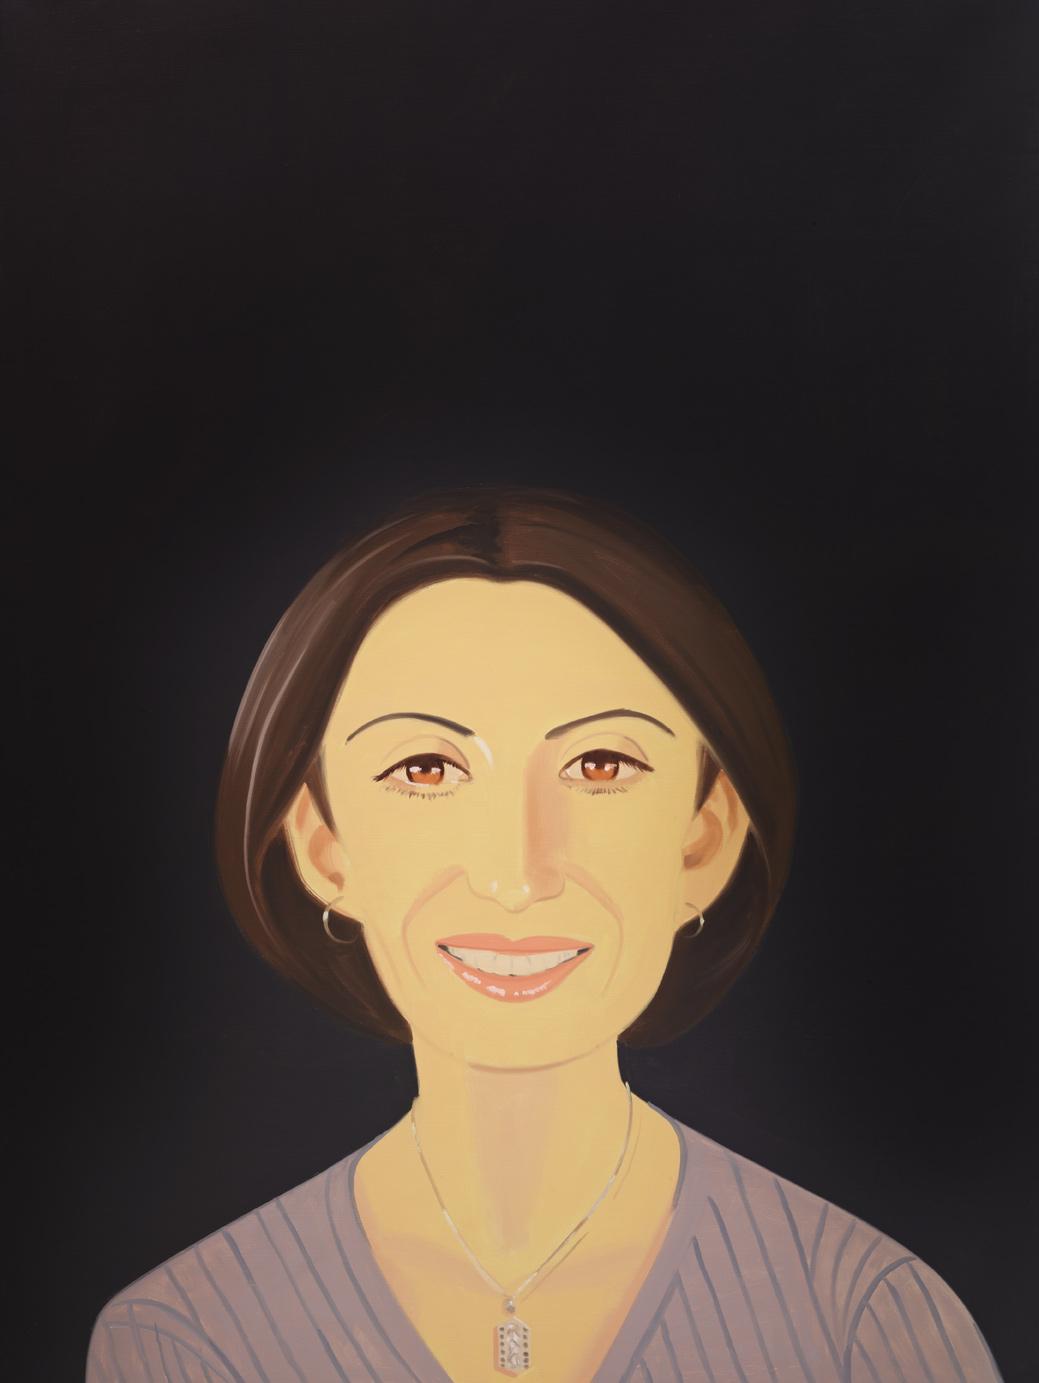 Ahn irribarrez | Alex Katz | Guggenheim Bilbao Museoa